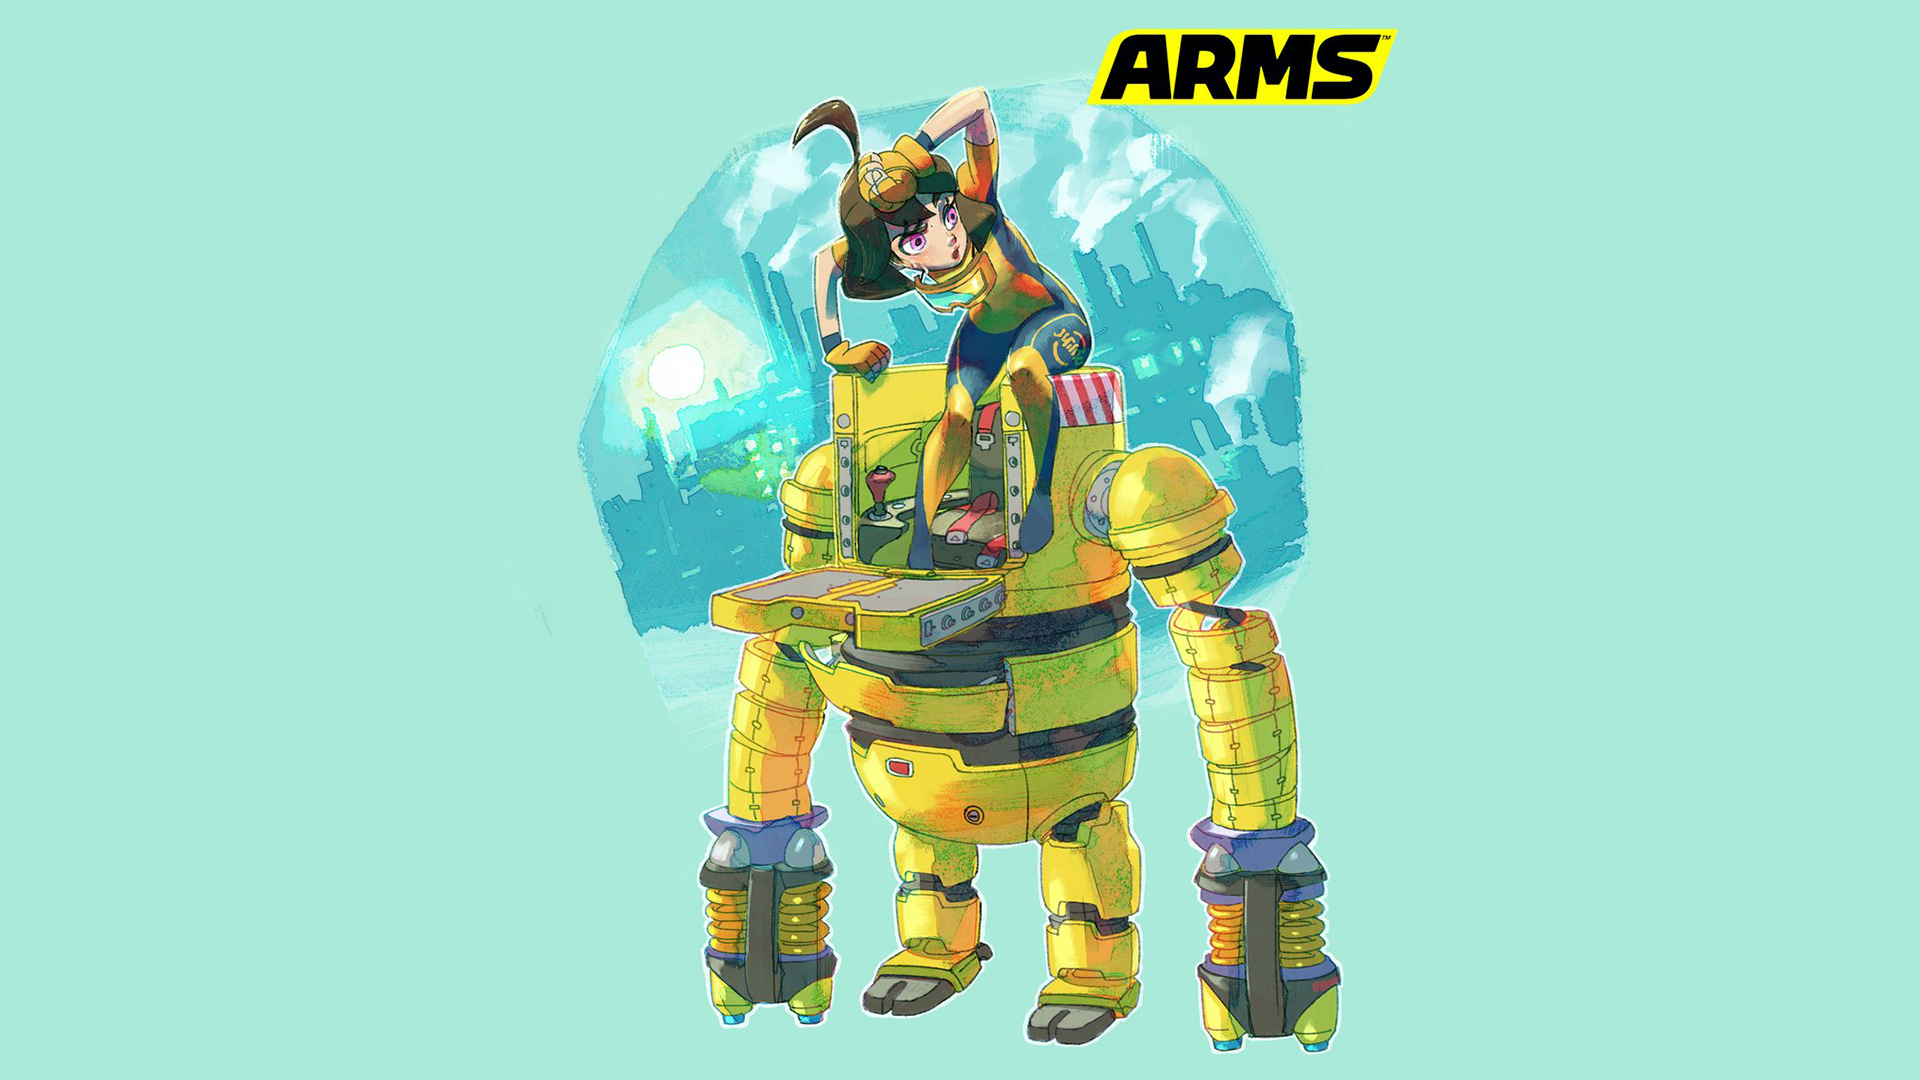 Splatoon Wallpaper Girls Nintendo Details The Backstory Of Arms Mechanica